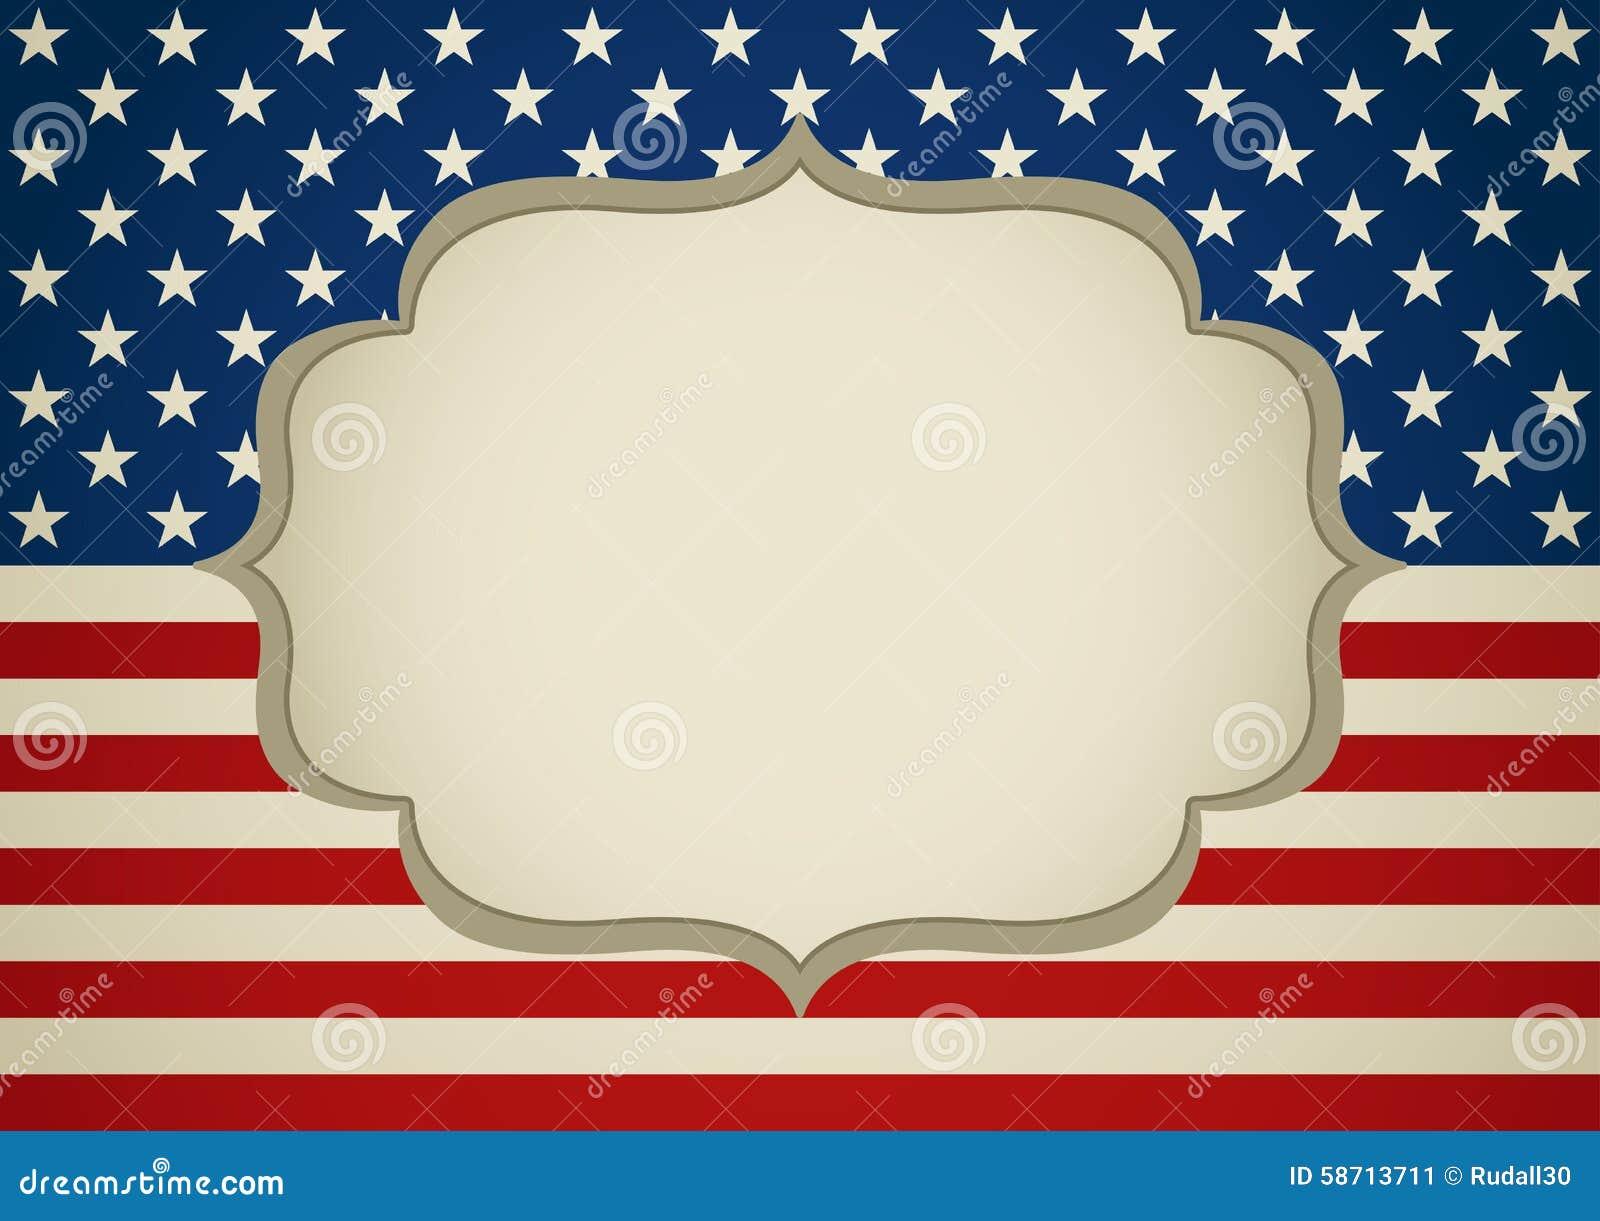 Leerer Rahmen Auf Amerika-Insignien Vektor Abbildung - Illustration ...